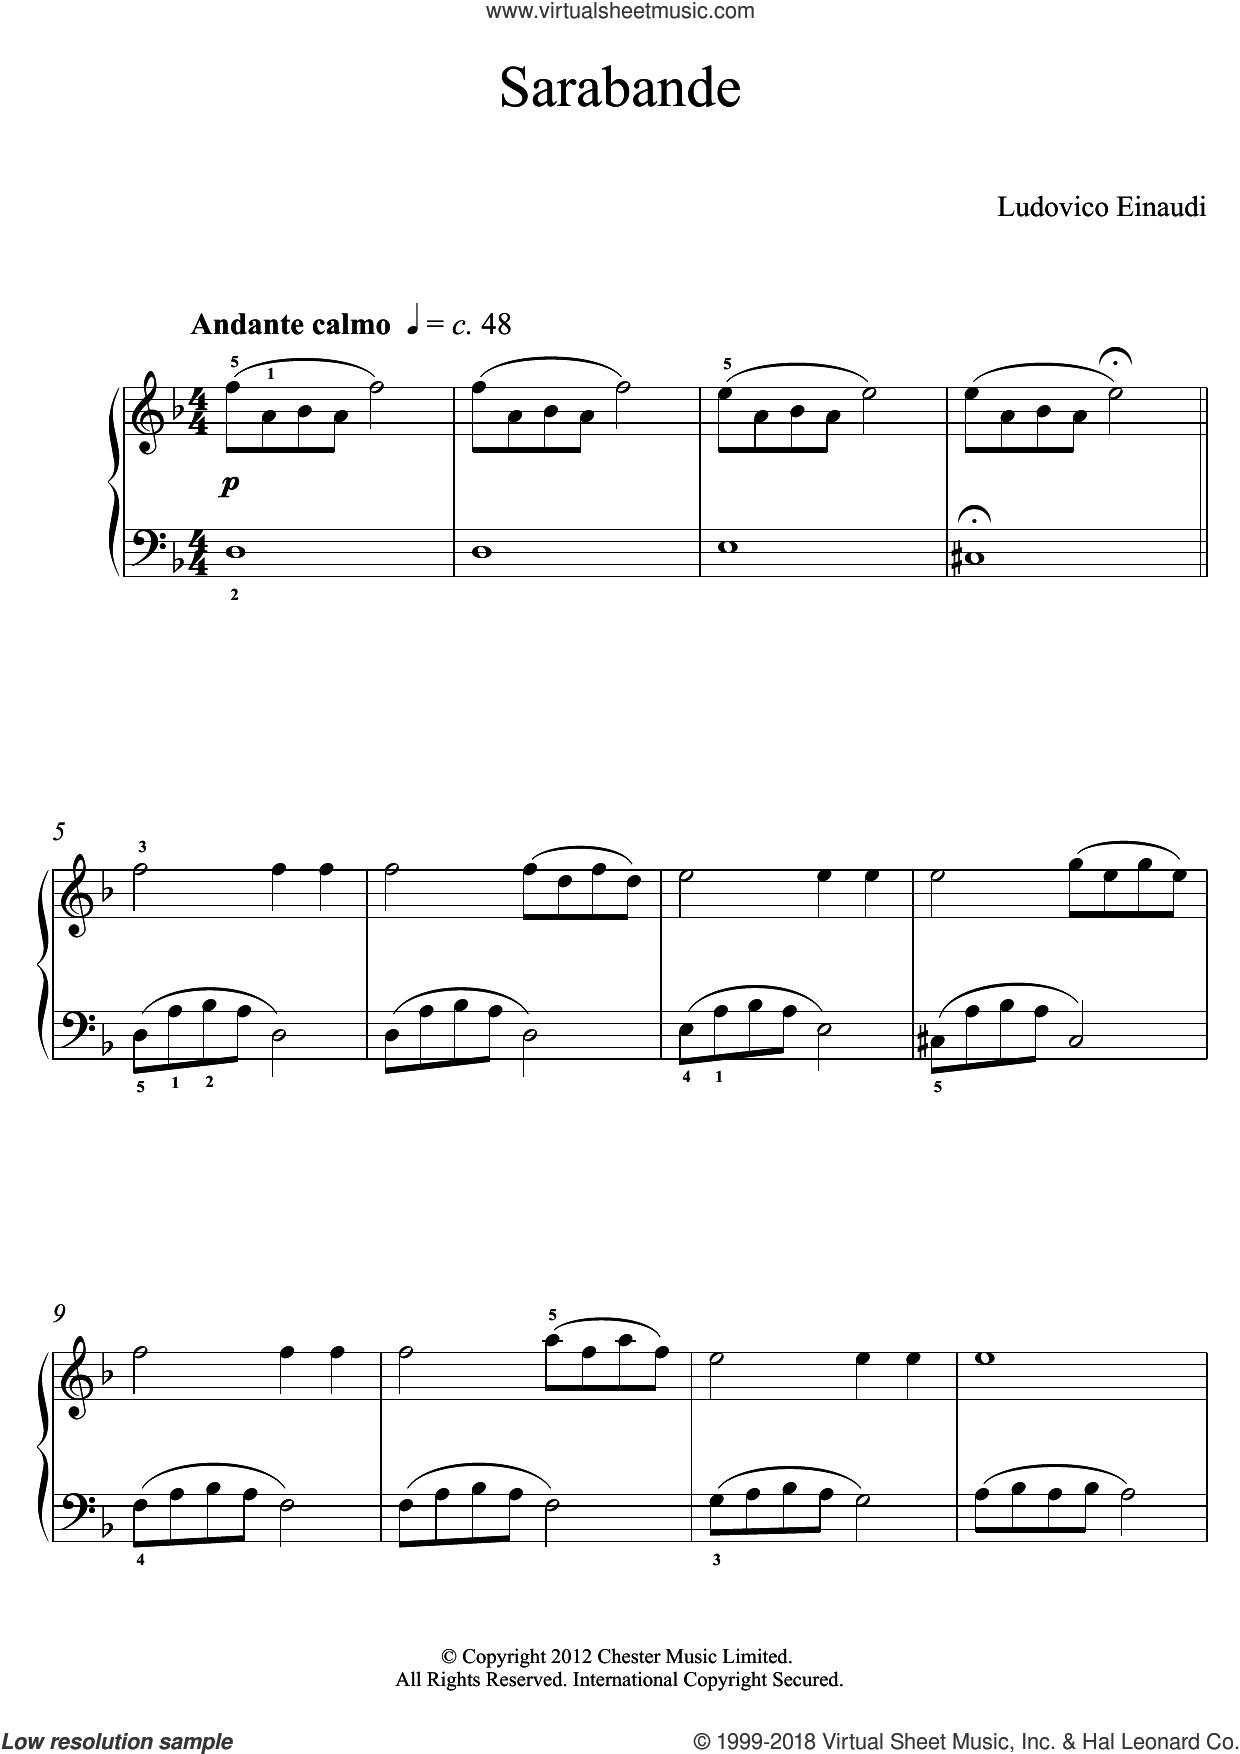 Sarabande sheet music for piano solo (elementary) by Ludovico Einaudi, classical score, beginner piano (elementary)